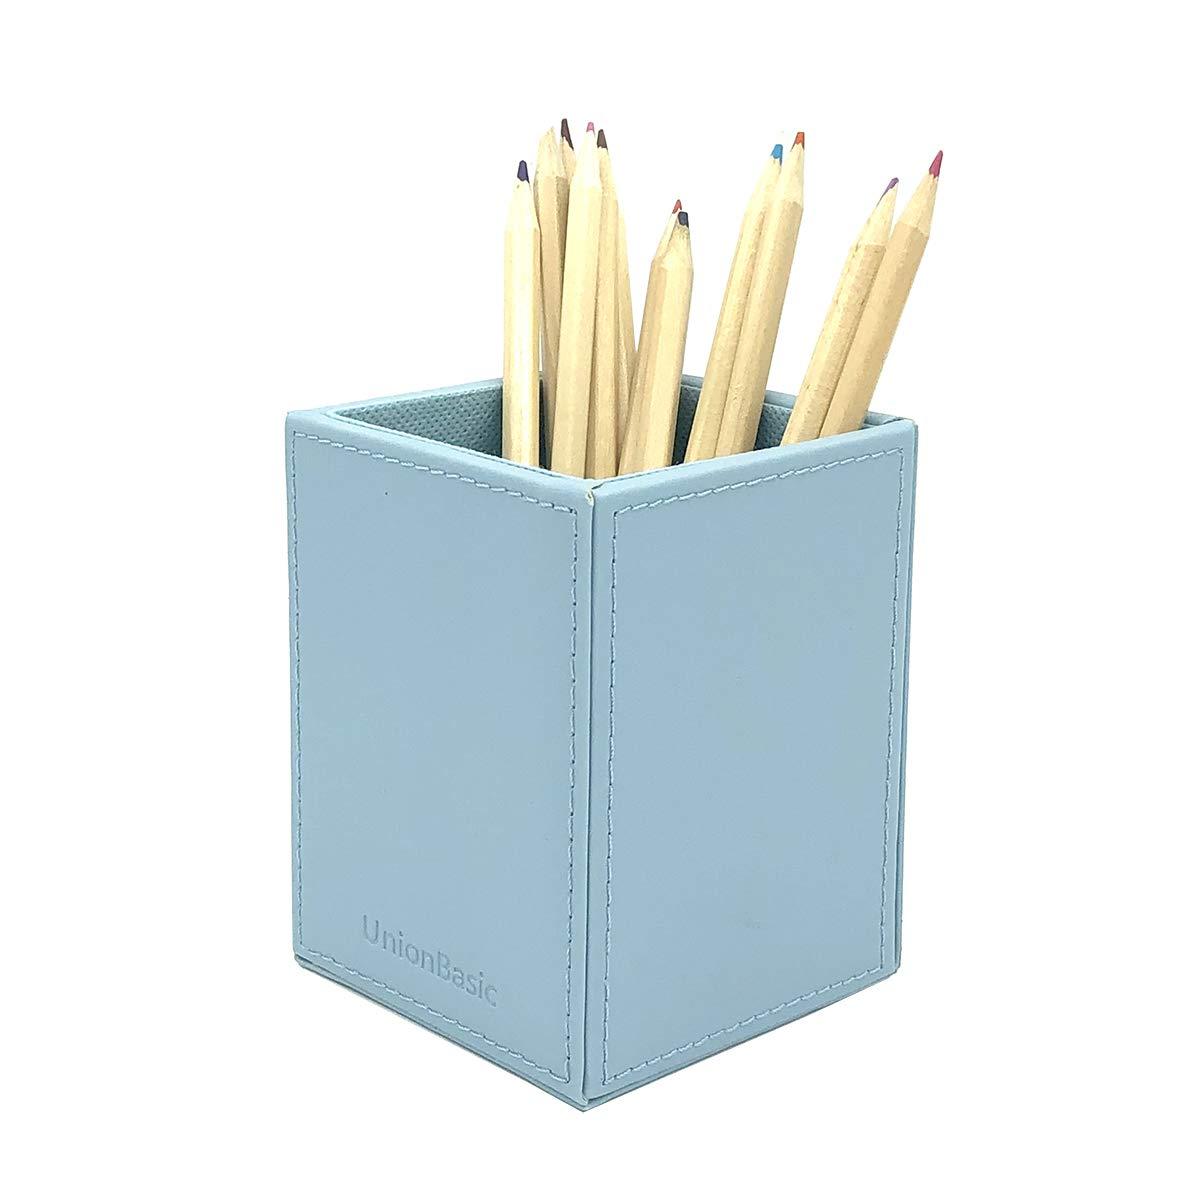 UnionBasic PU Leather Square Pens Pencils Cup Holder Desk Stationery Organizer (Blue)